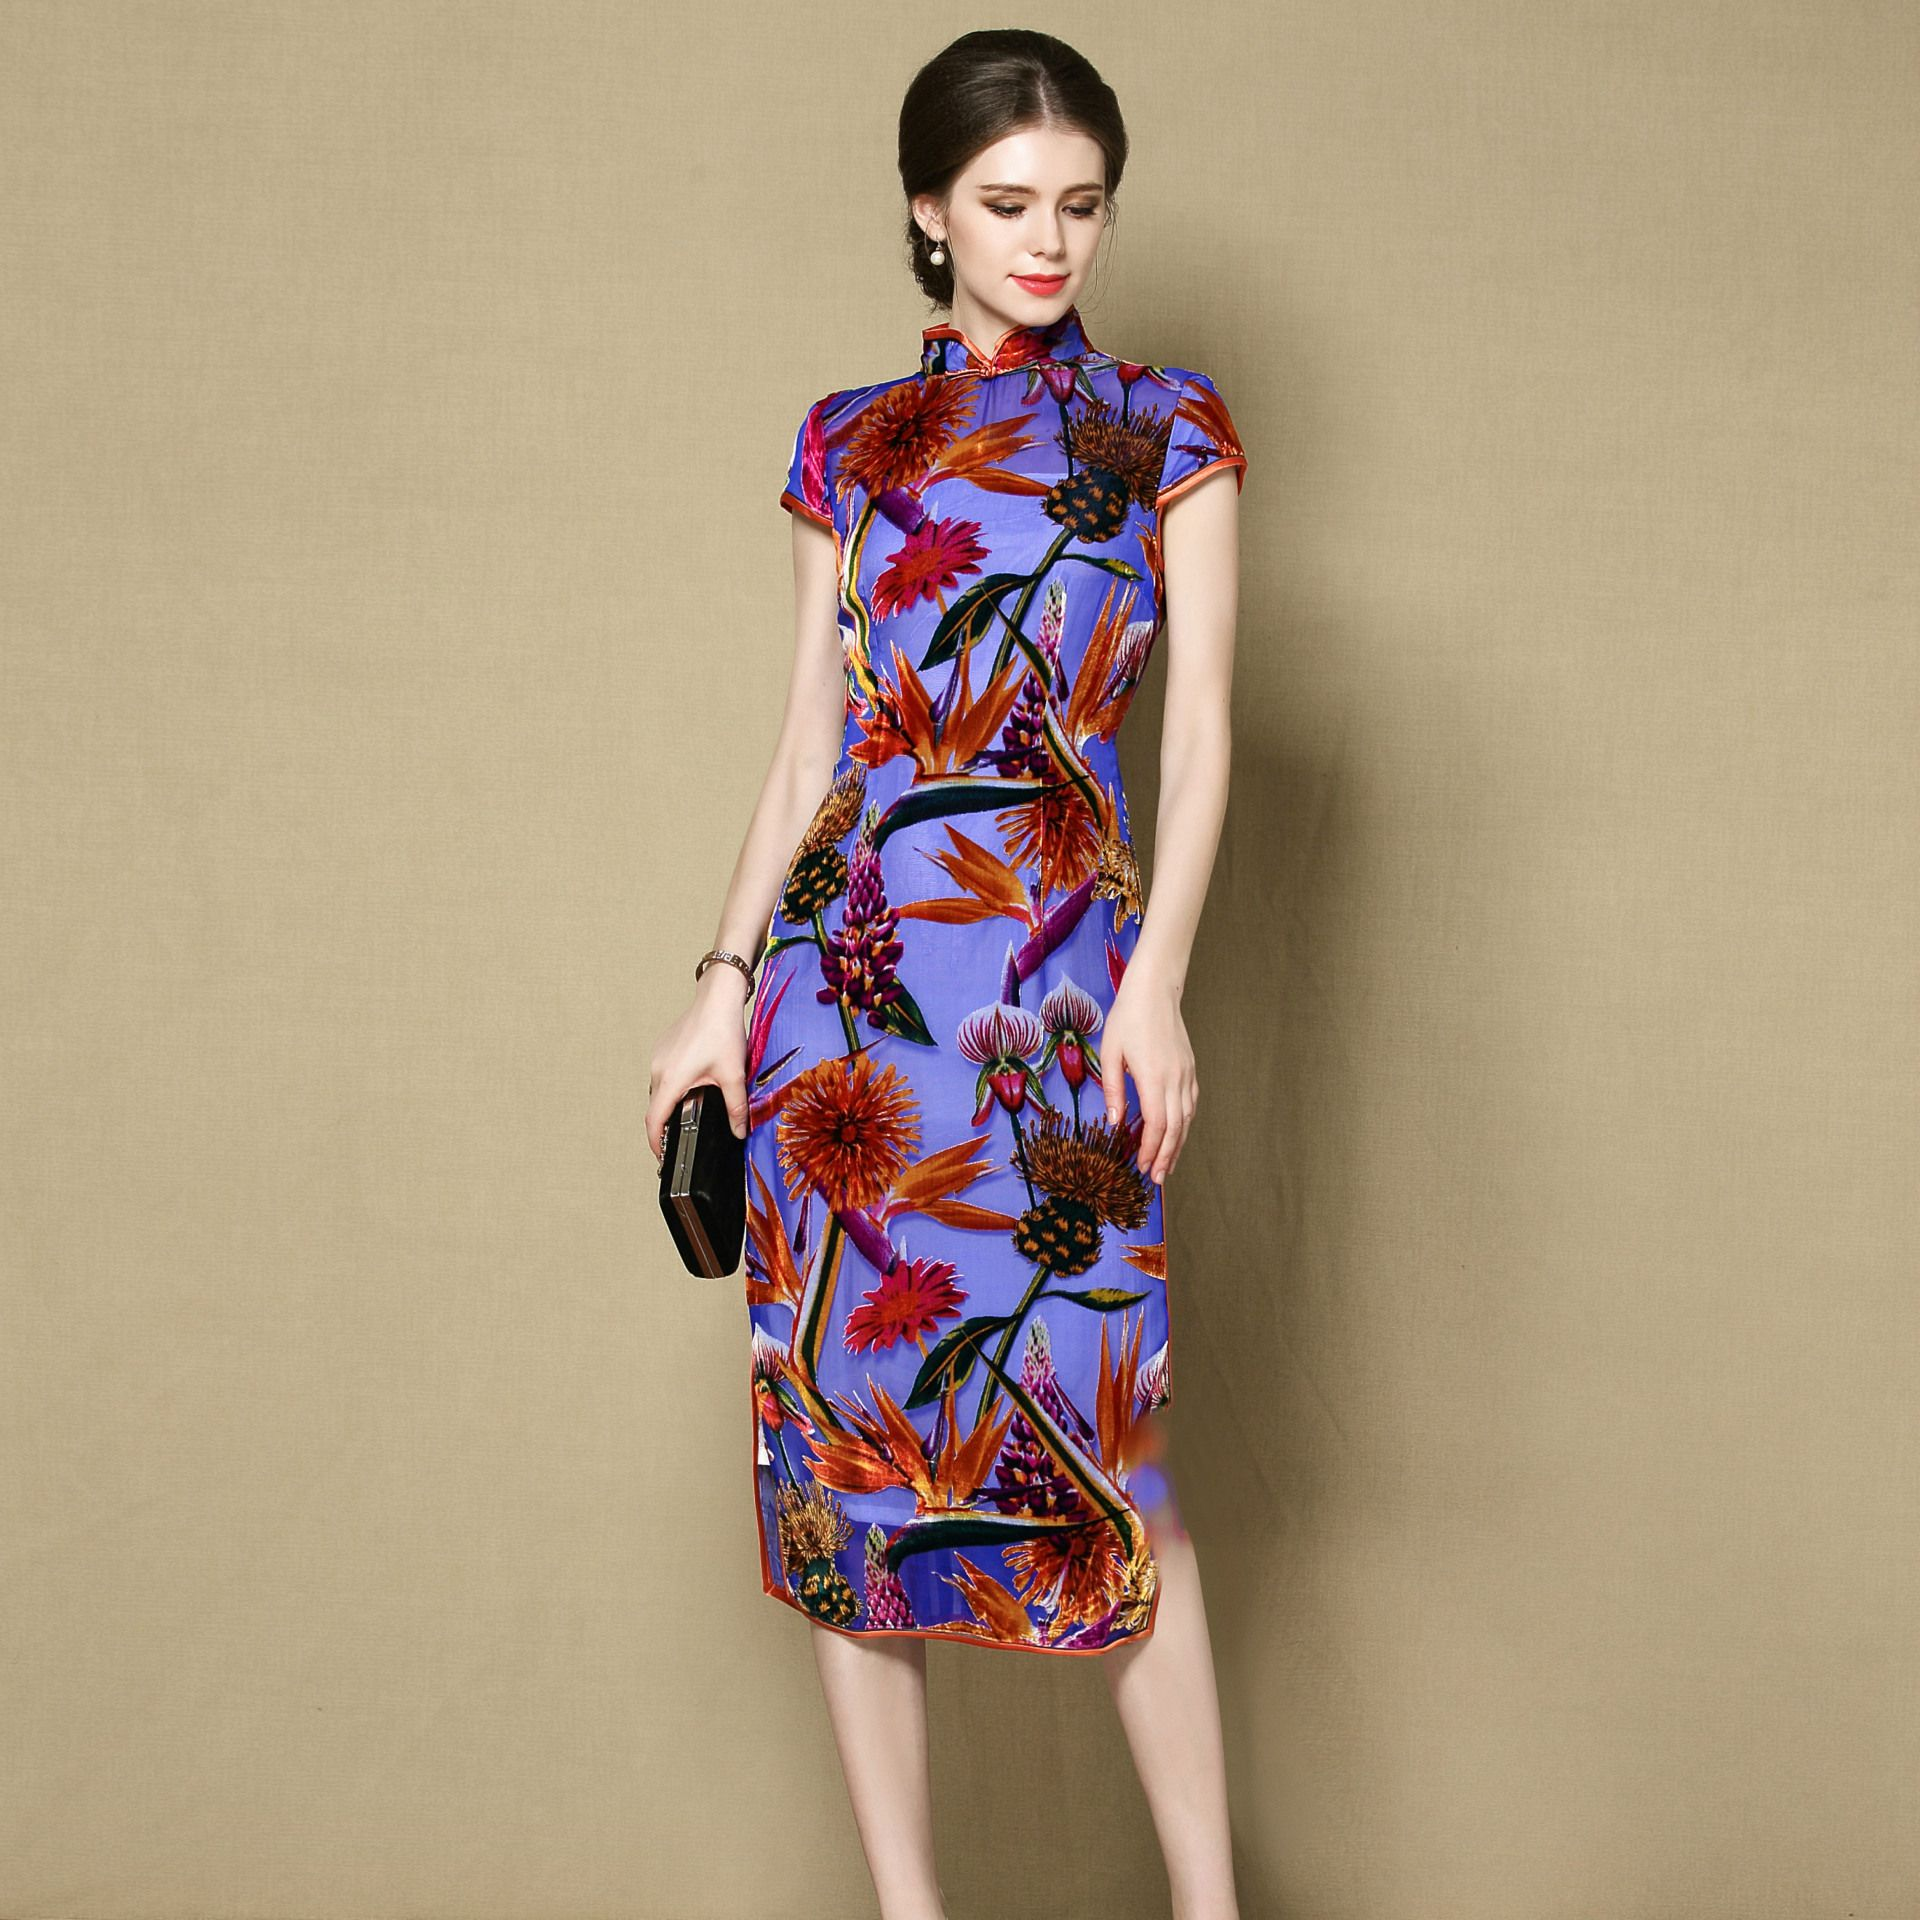 Ravishing Flocked Silk Cheongsam Qipao Dress - Blue